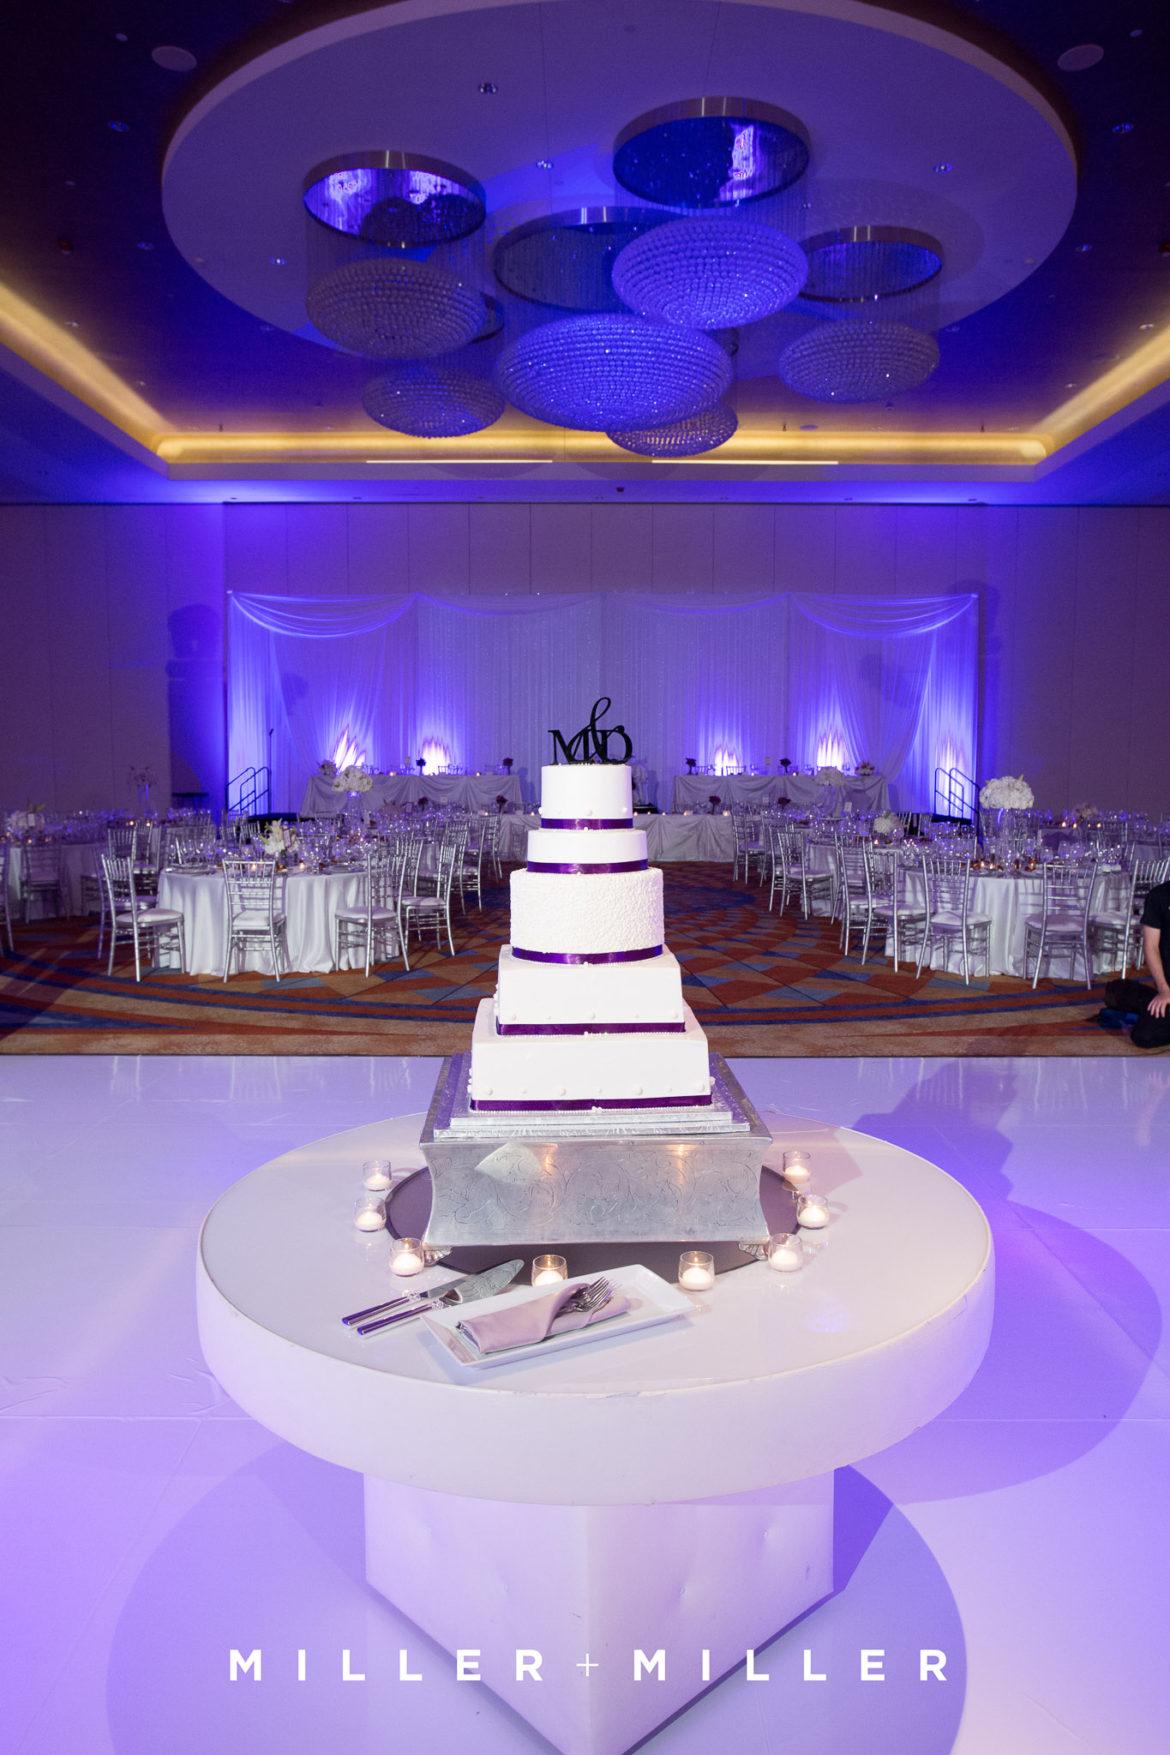 Elegant_Event_Lighting_Chicago_Renaissance_Schaumburg_Wedding_Uplighting_Purple_White_Backdrop_Draping_White_Vinyl_Dance_Floor_Flower